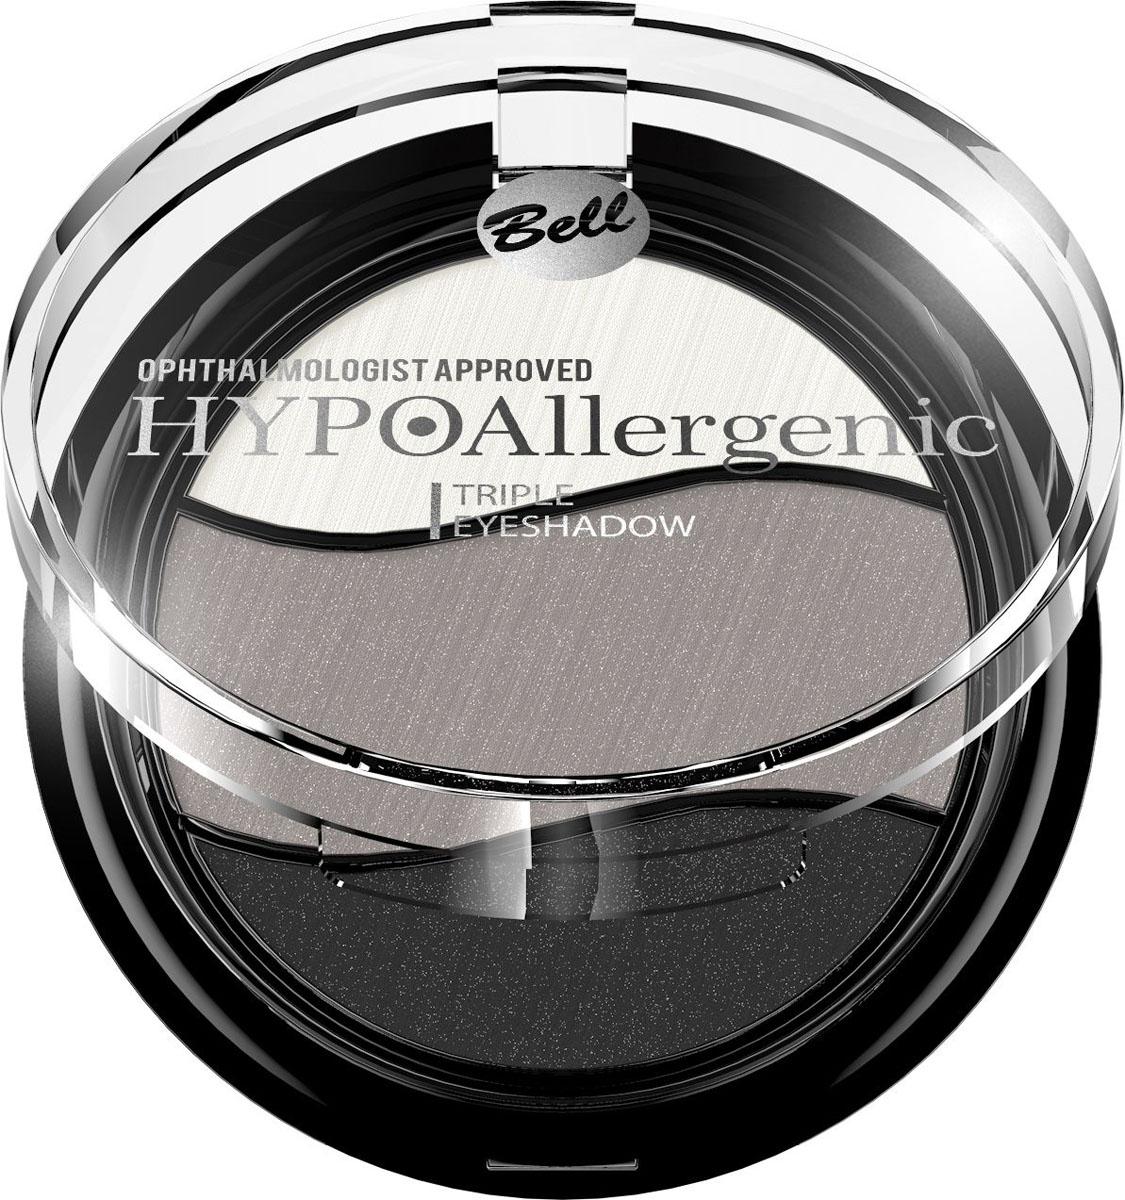 Bell Hypoallergenic Тени для век трехцветные, гипоаллергенные Triple Eyeshadow, Тон №08